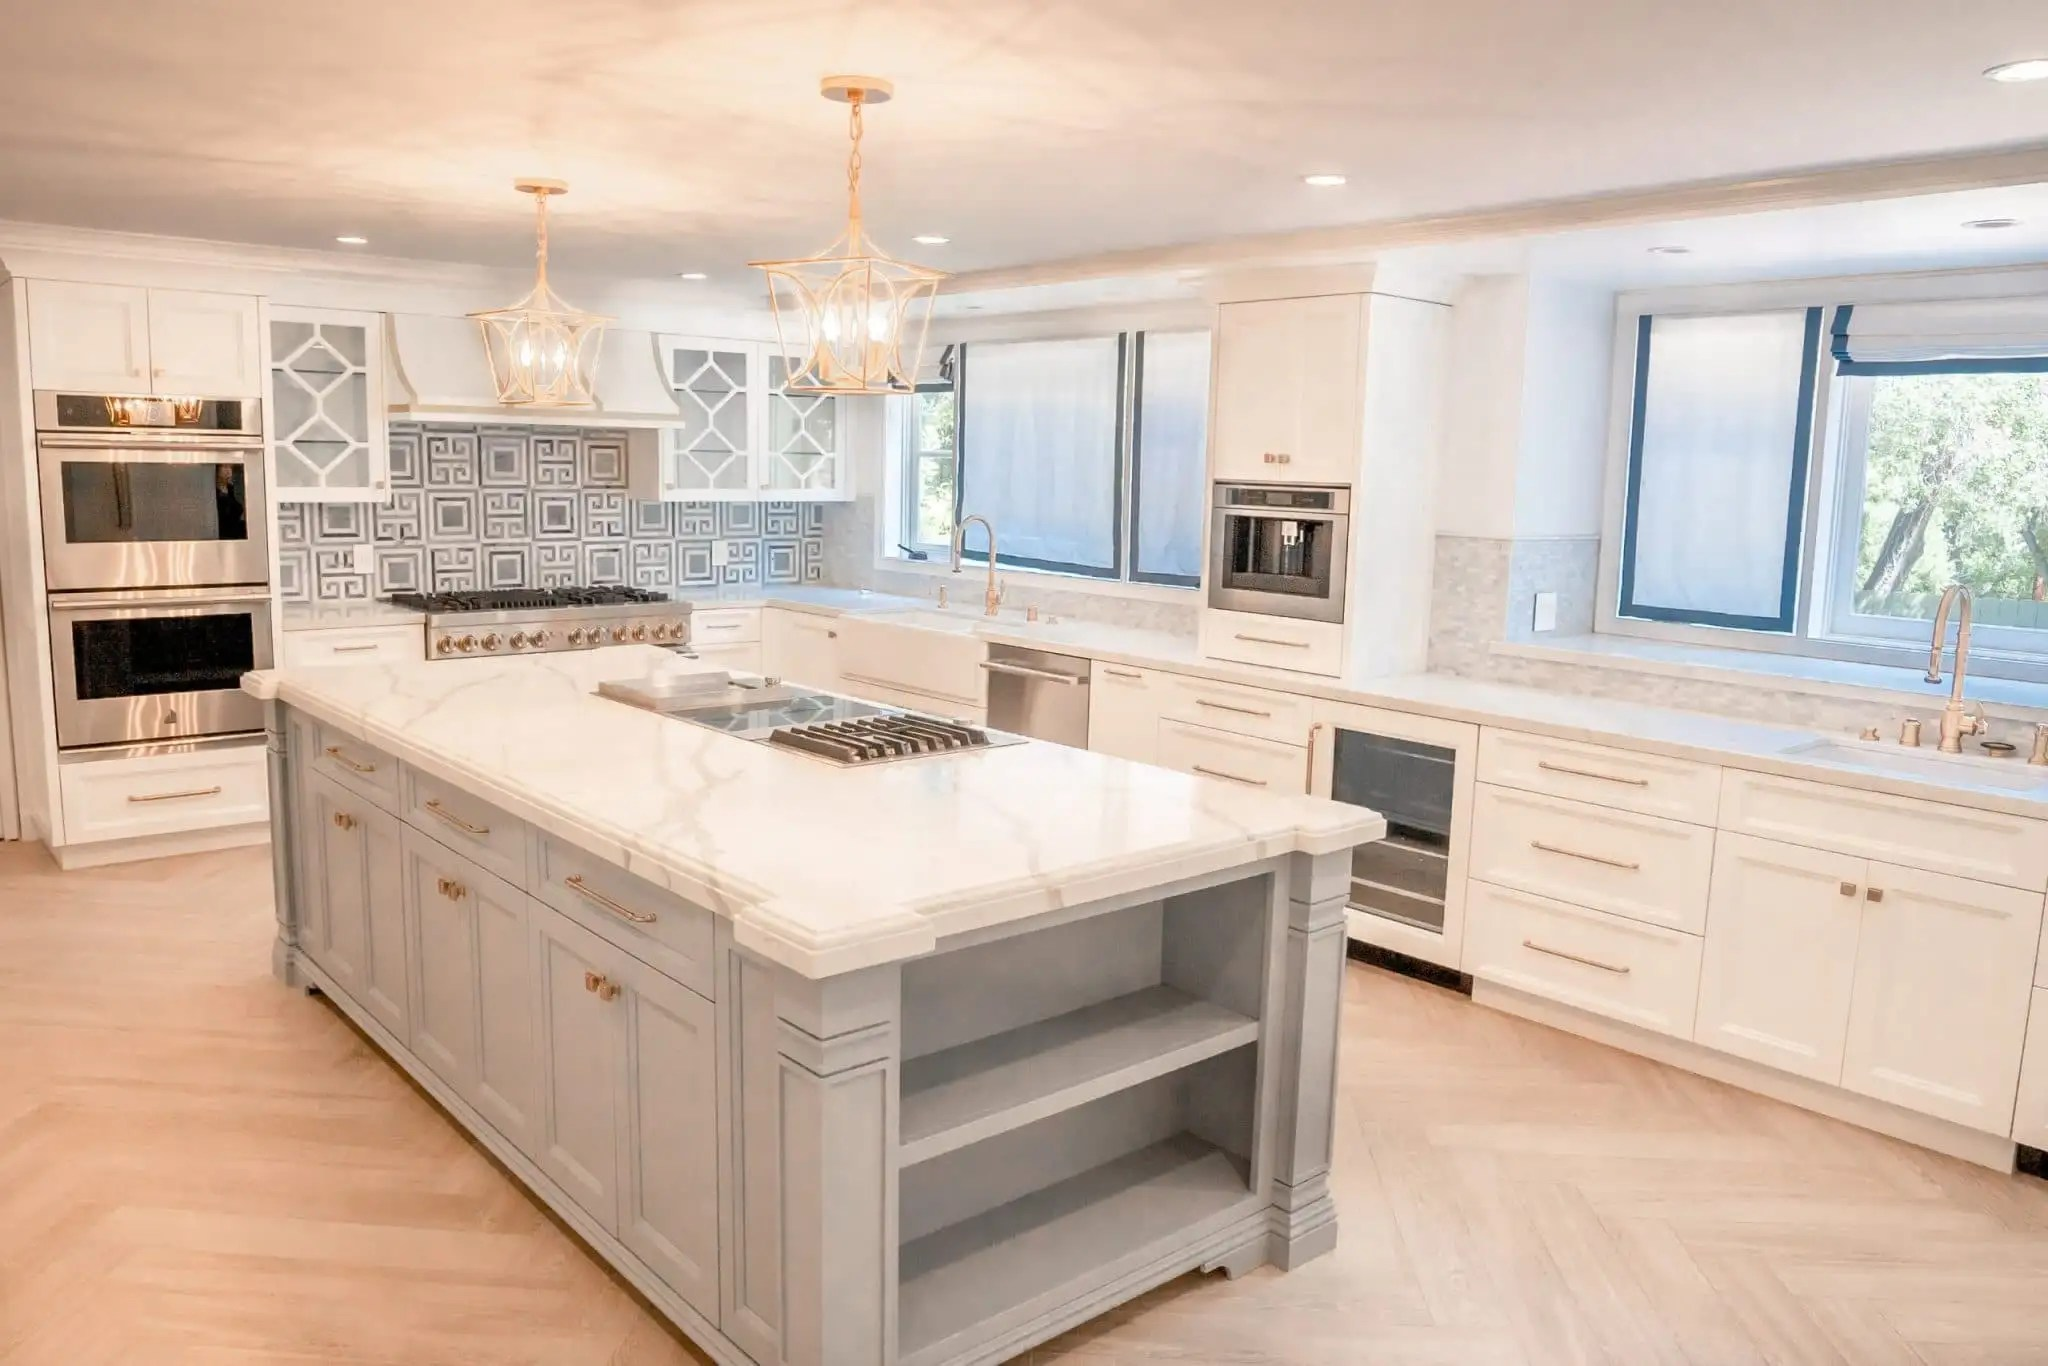 9 beautiful kitchen island ideas with